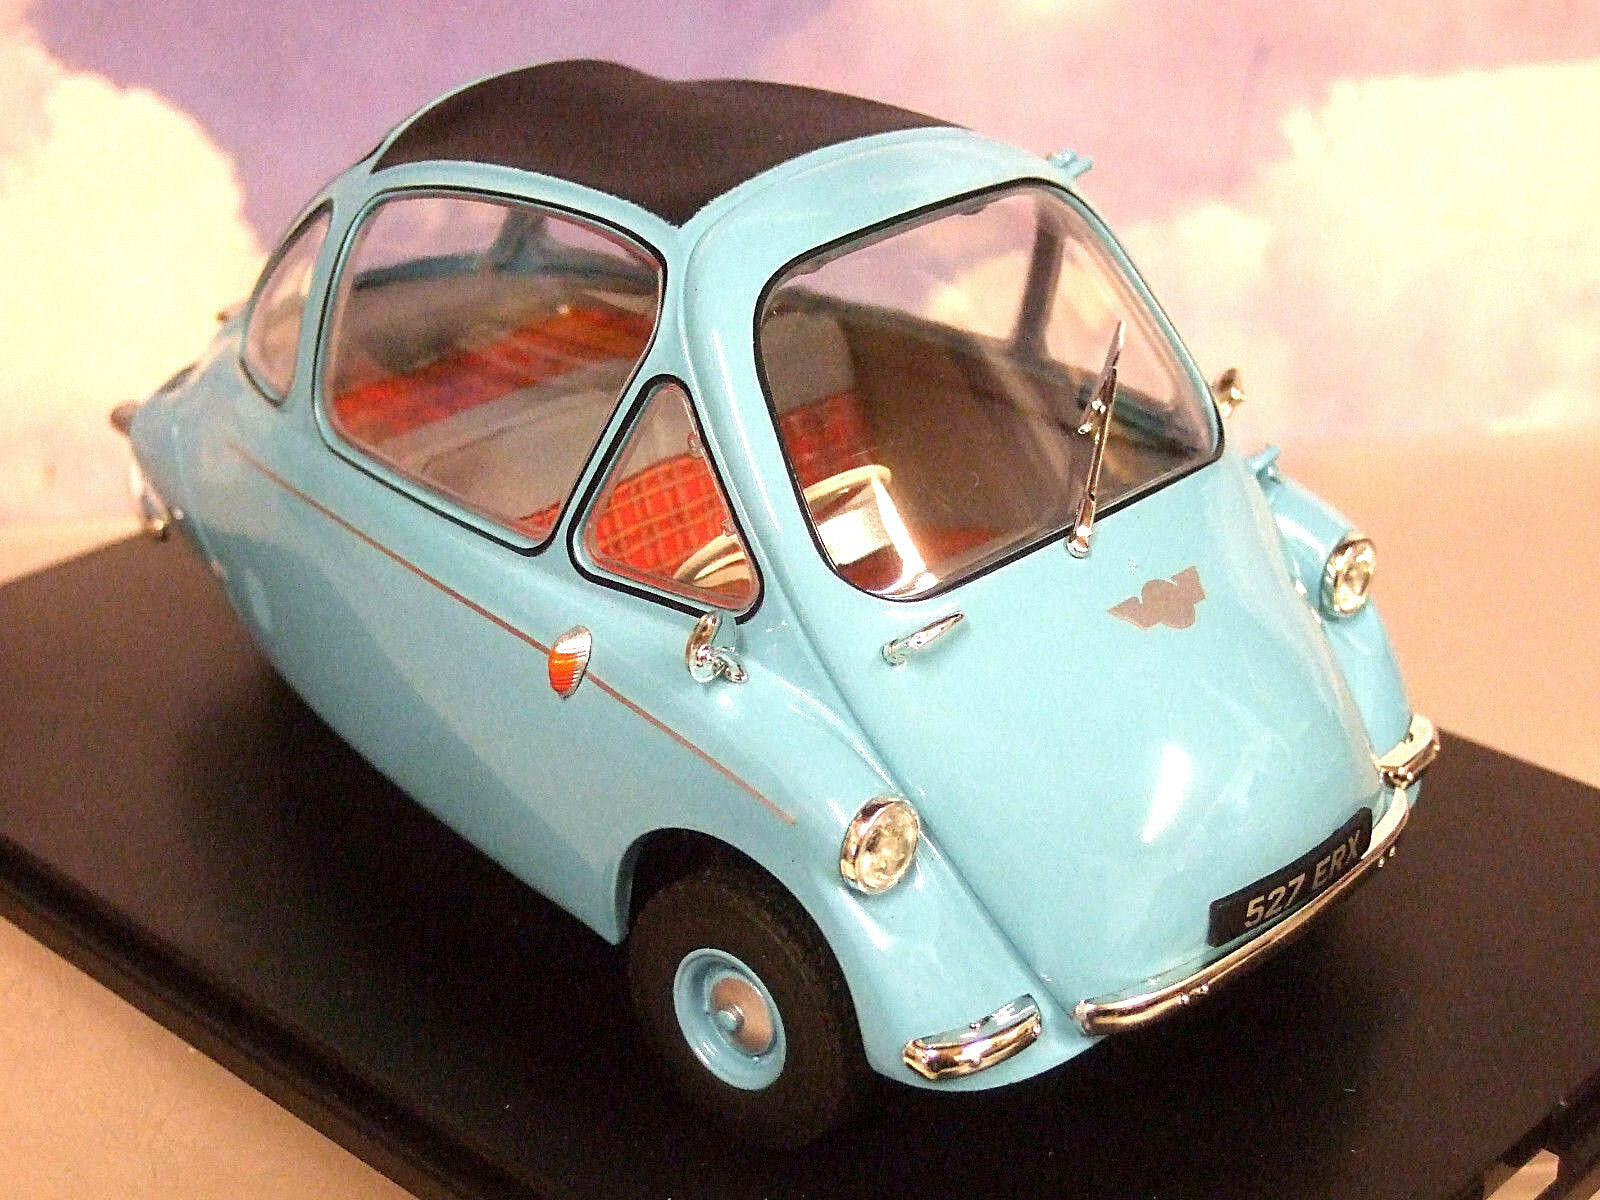 Oxford Diecast 1 18 Heinkel Trojan Bubble Car RHD (Kabine) in Roman Blau